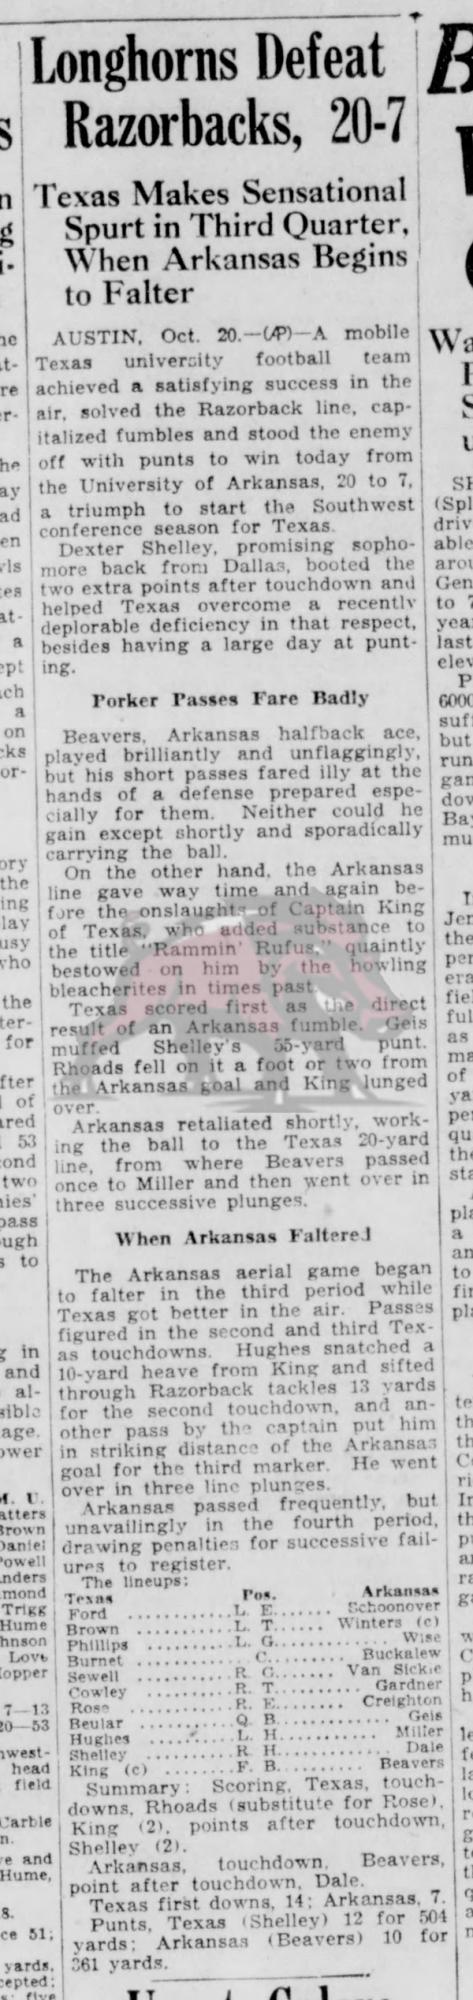 1928-10-21 The_Waco_News_Tribune_Sun__Oct_21__1928 p. 8  Game 12